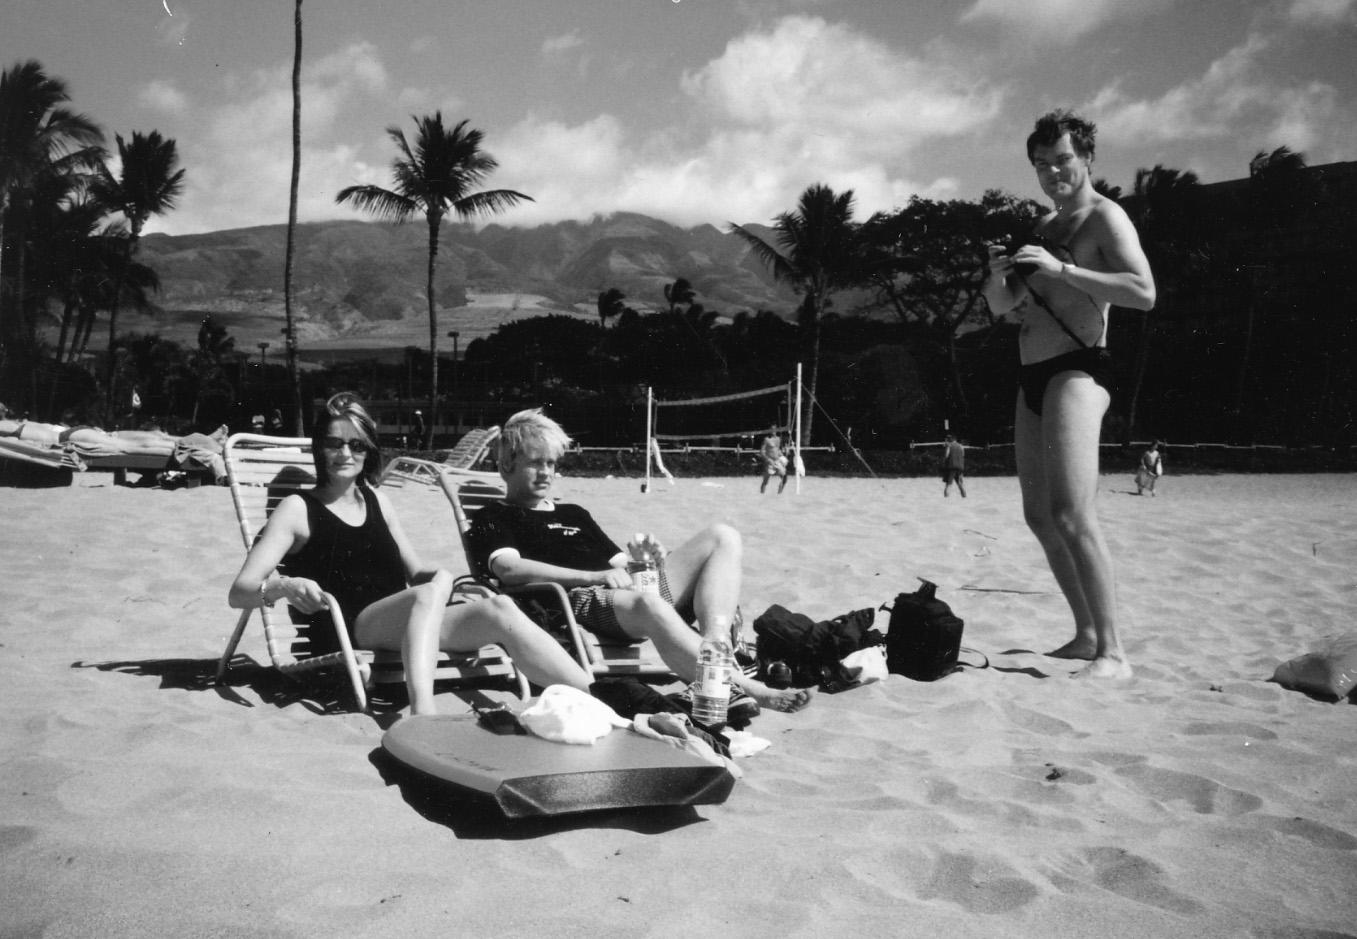 The good life. Marianne Søndergaard, Jam Poulsen, Thomas Søie Hansen, Maui, Hawaii. Februar 23, 1998. Photo: Henrik Tuxen.